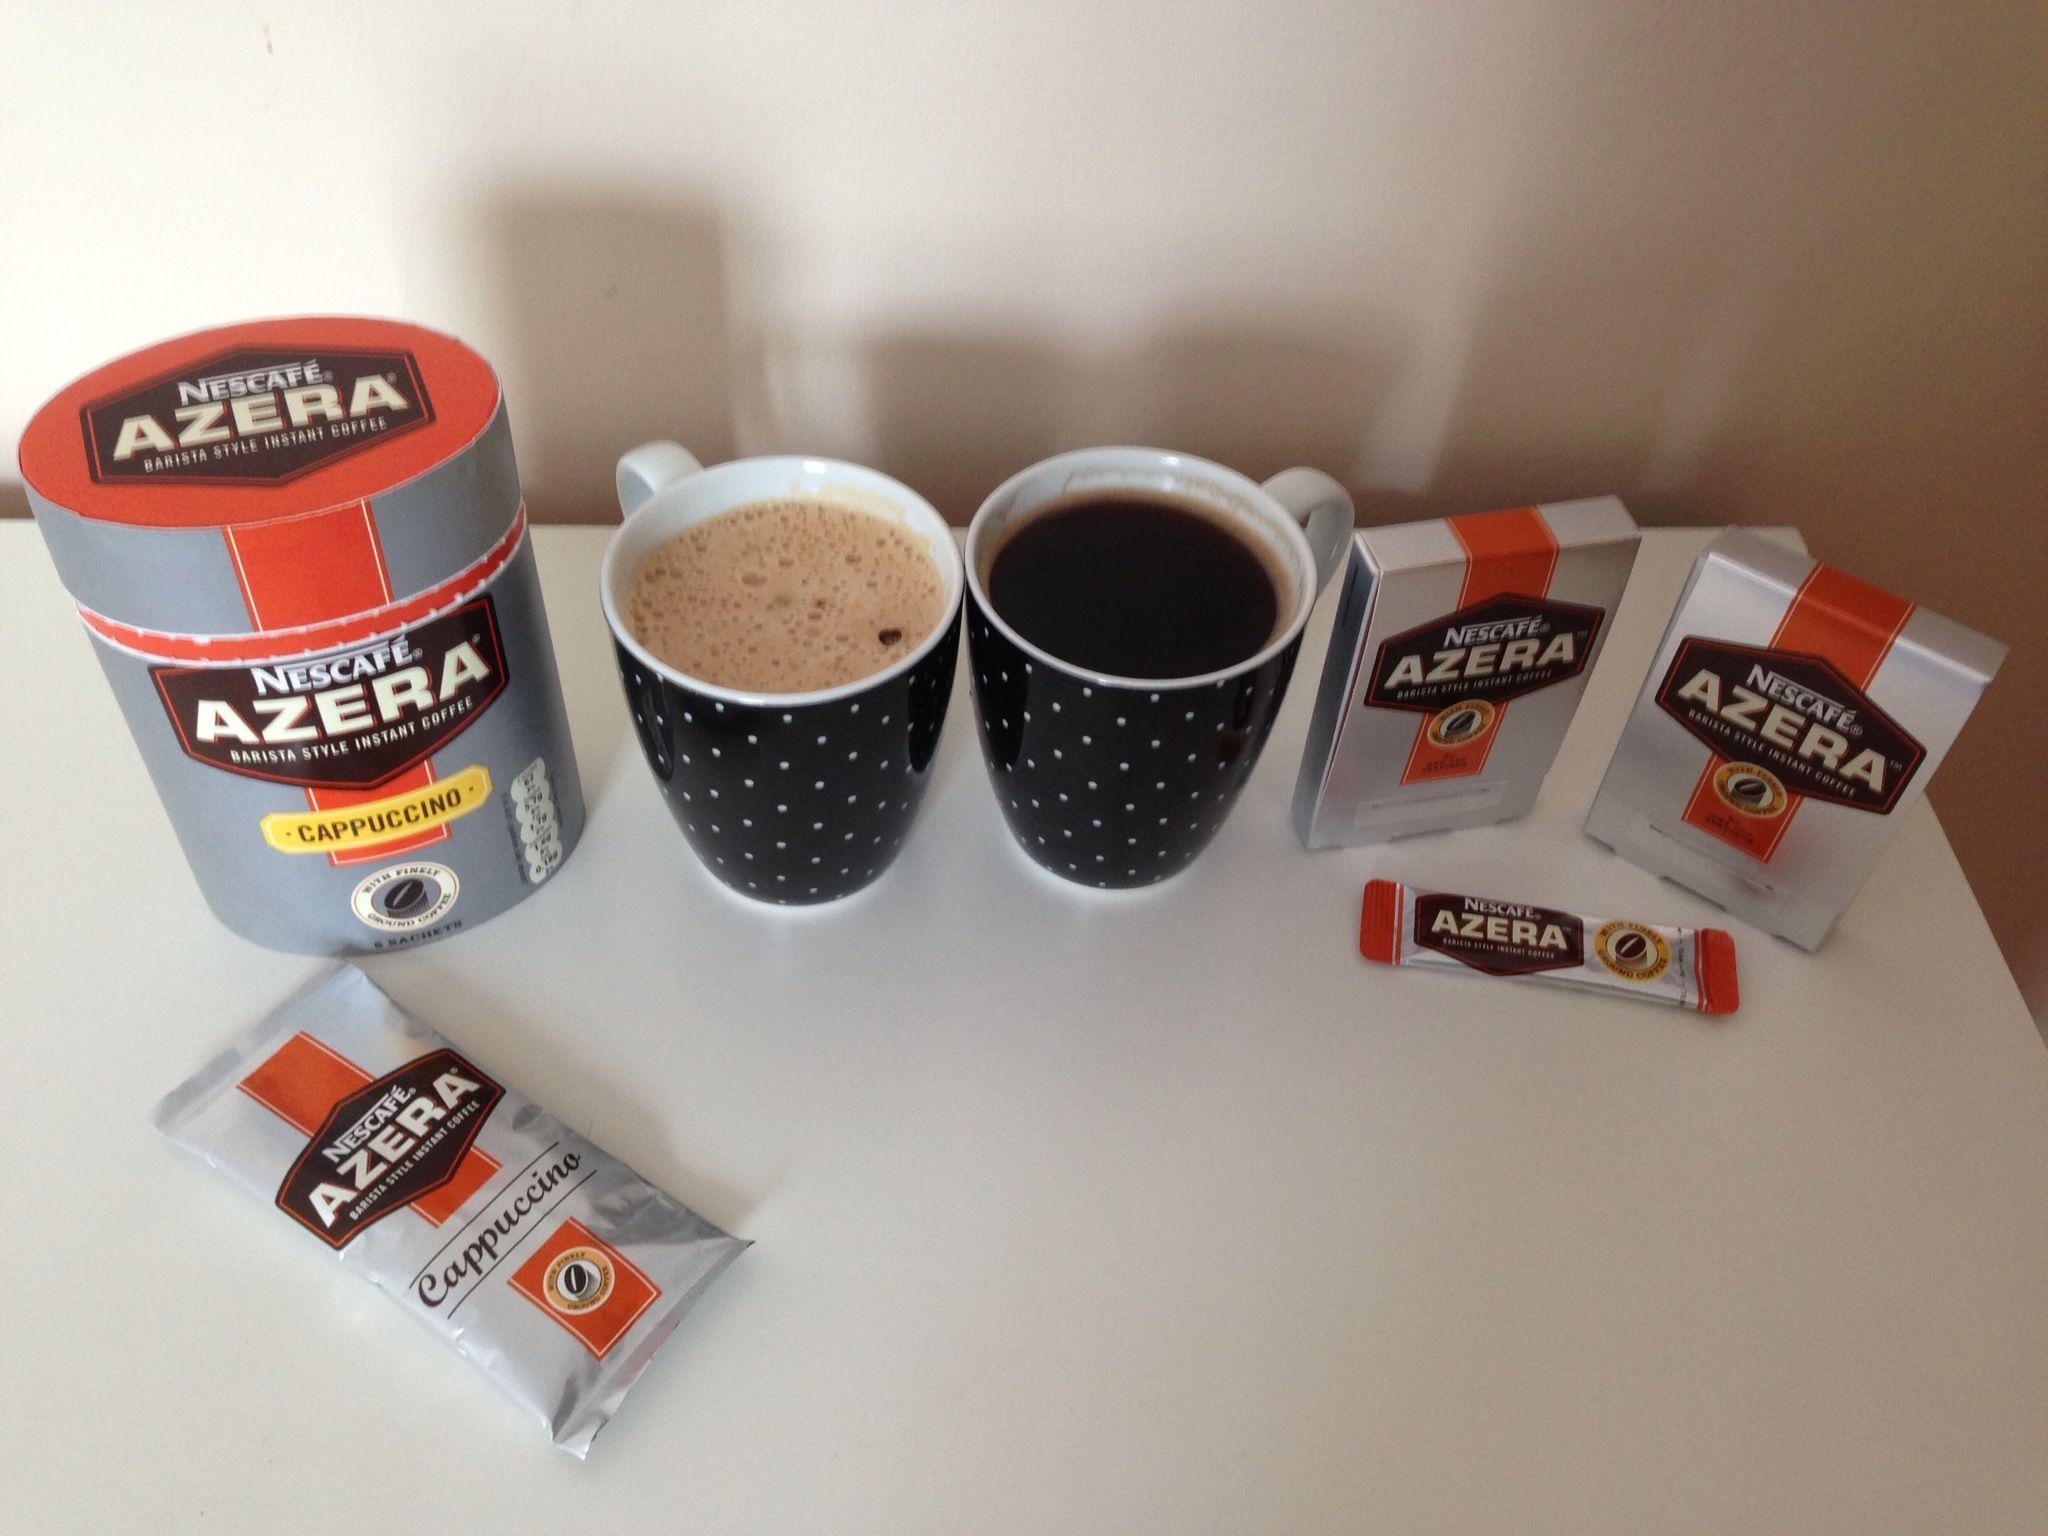 Azera Cappucino and Instant Coffee GOTITFREE Nescafe